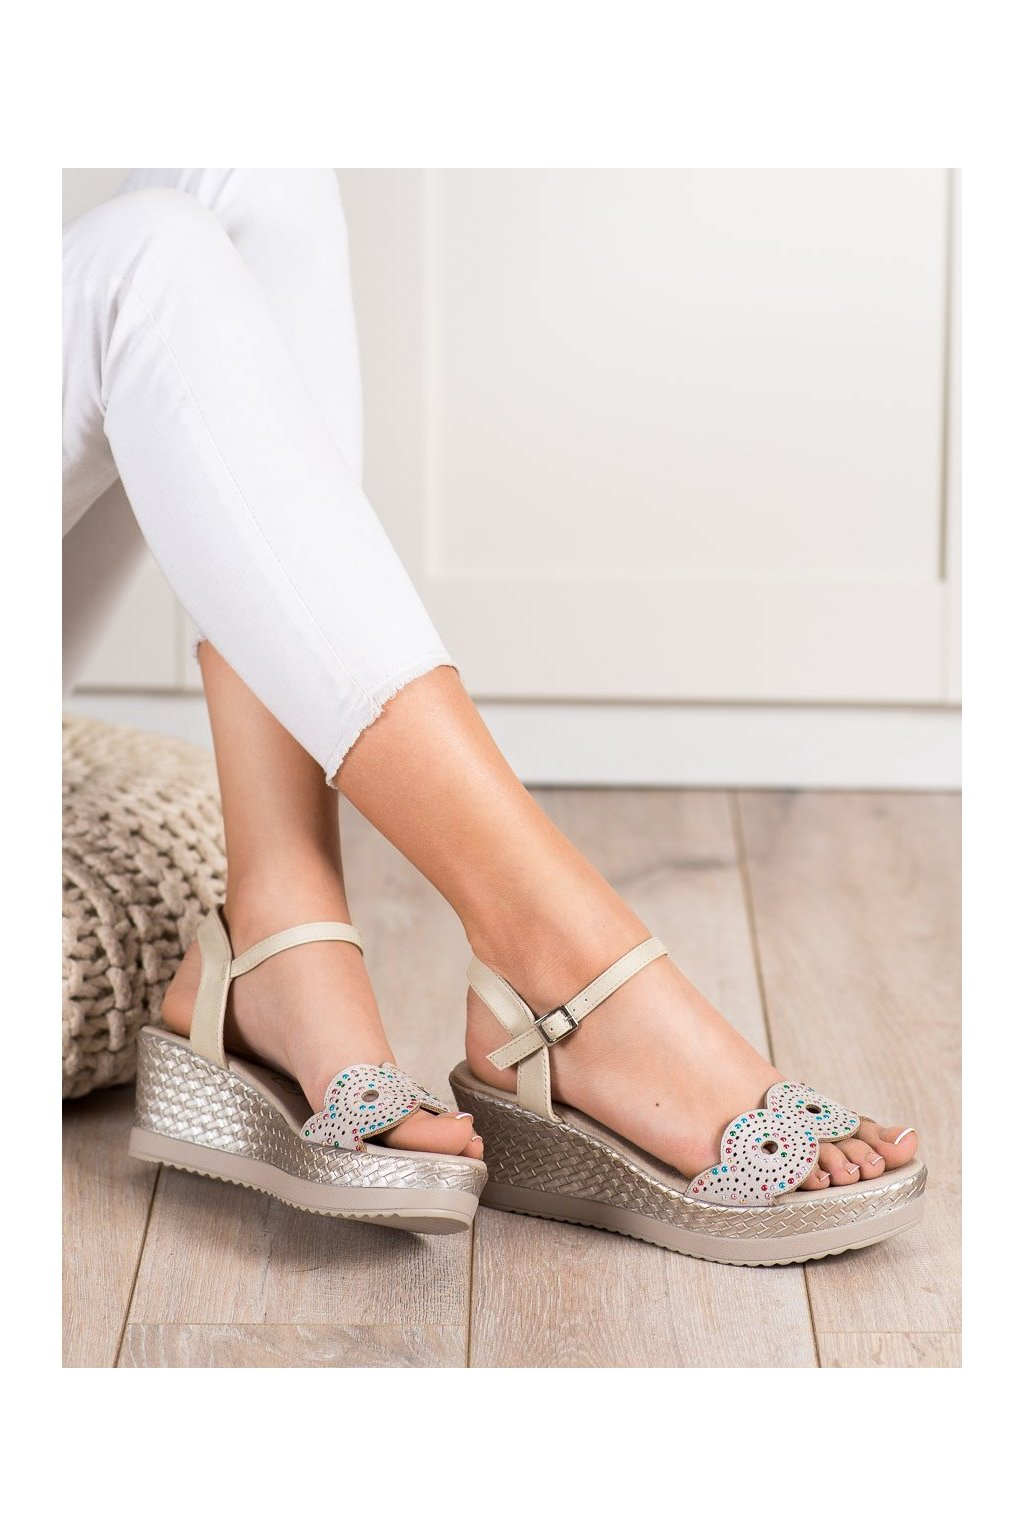 Hnedé sandále na platforme Kylie kod A119-04-02M-TA